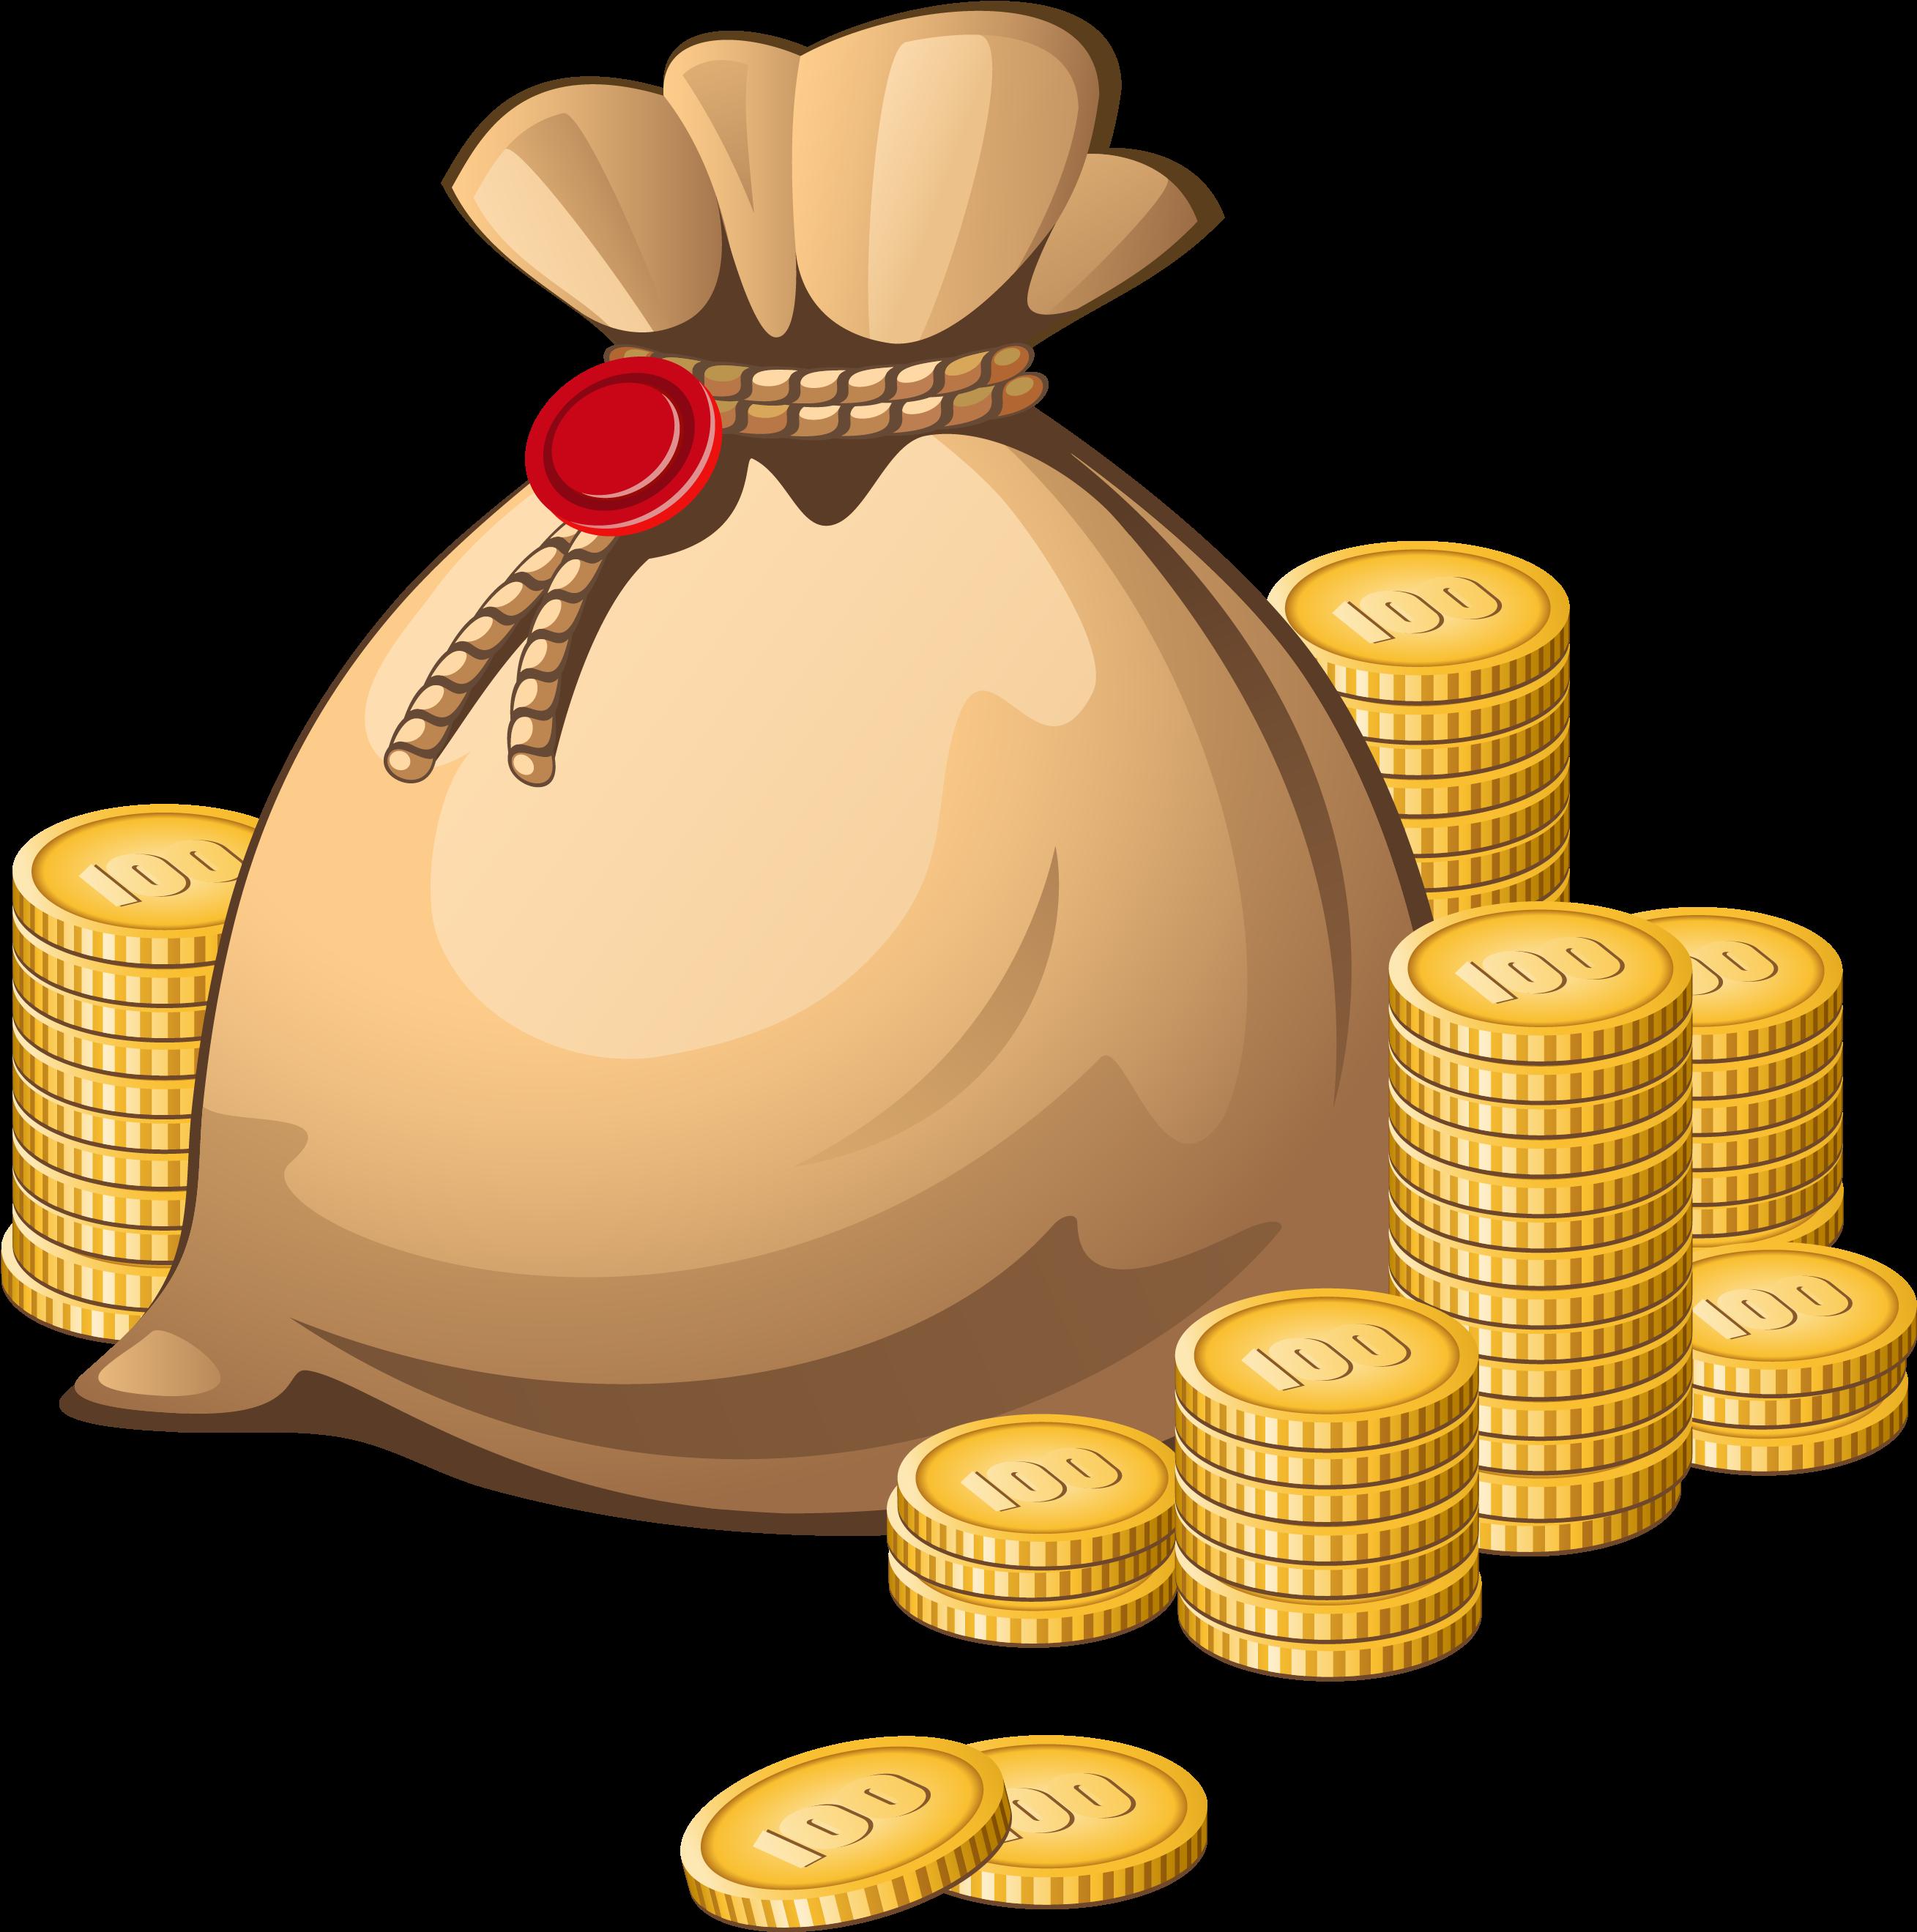 Coins clipart bag coin. Money royalty free clip